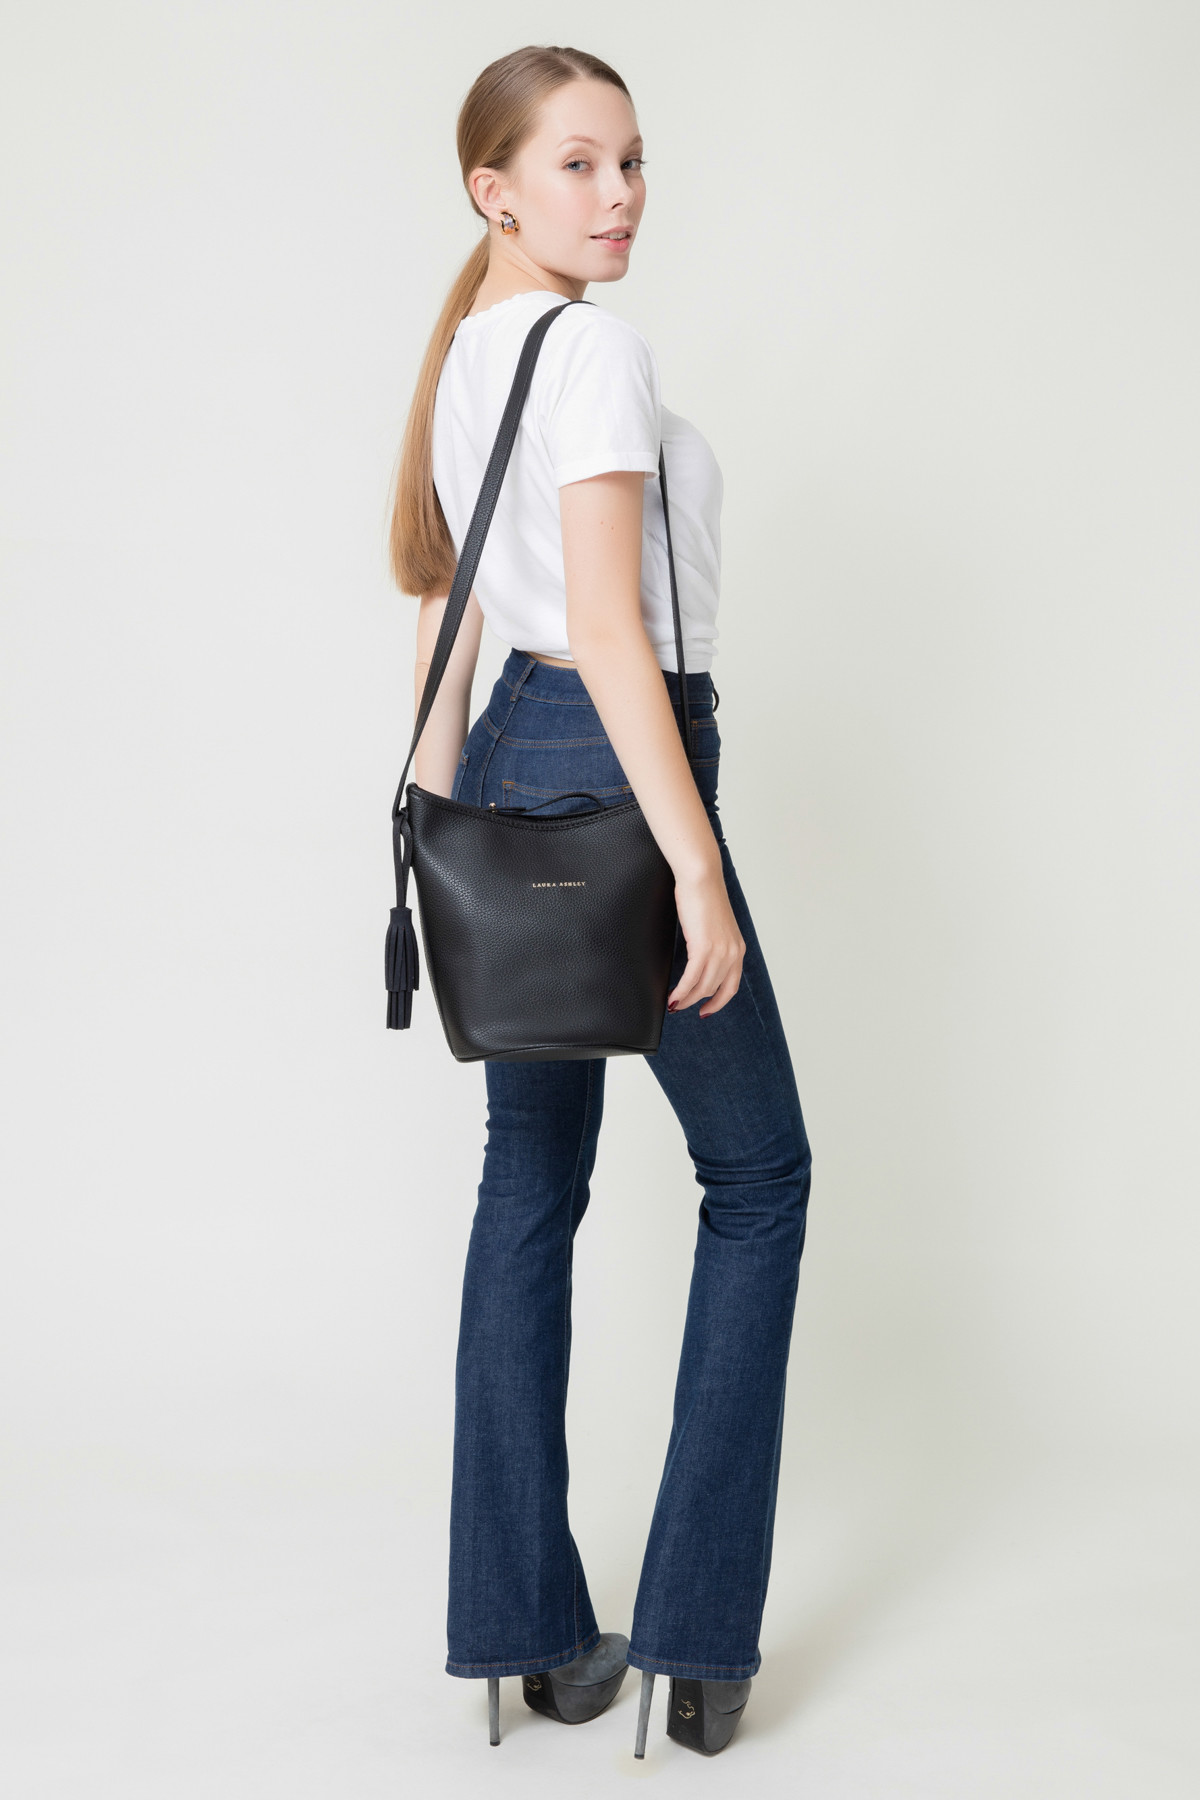 Laura Ashley Kadın Püsküllü Çanta Siyah 1